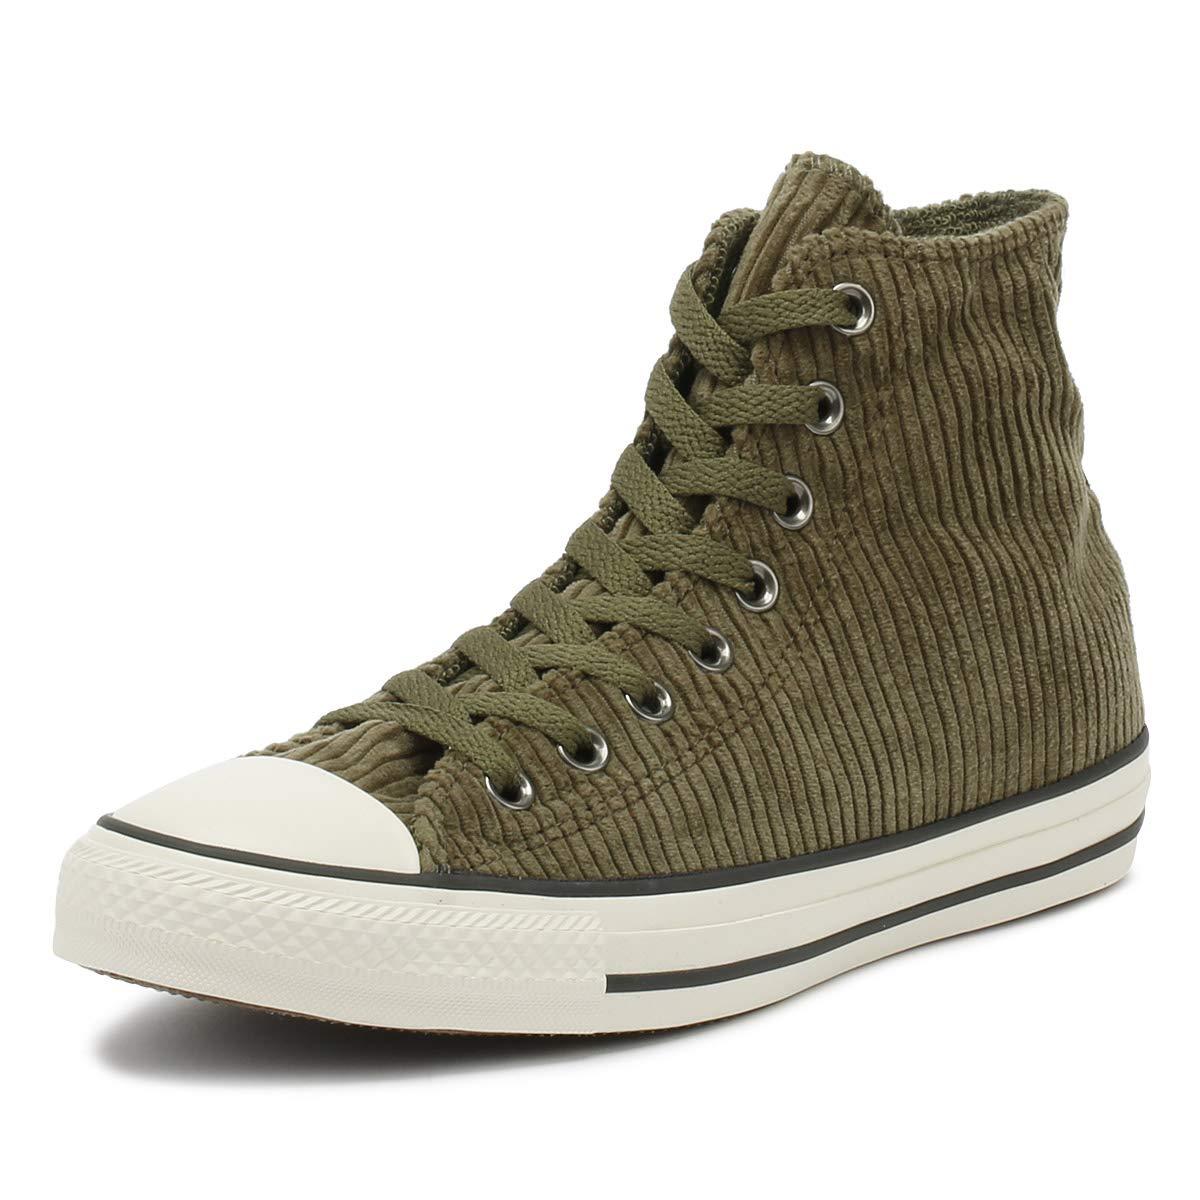 Converse Unisex-Erwachsene Chuck Taylor CTAS Hi Sneakers